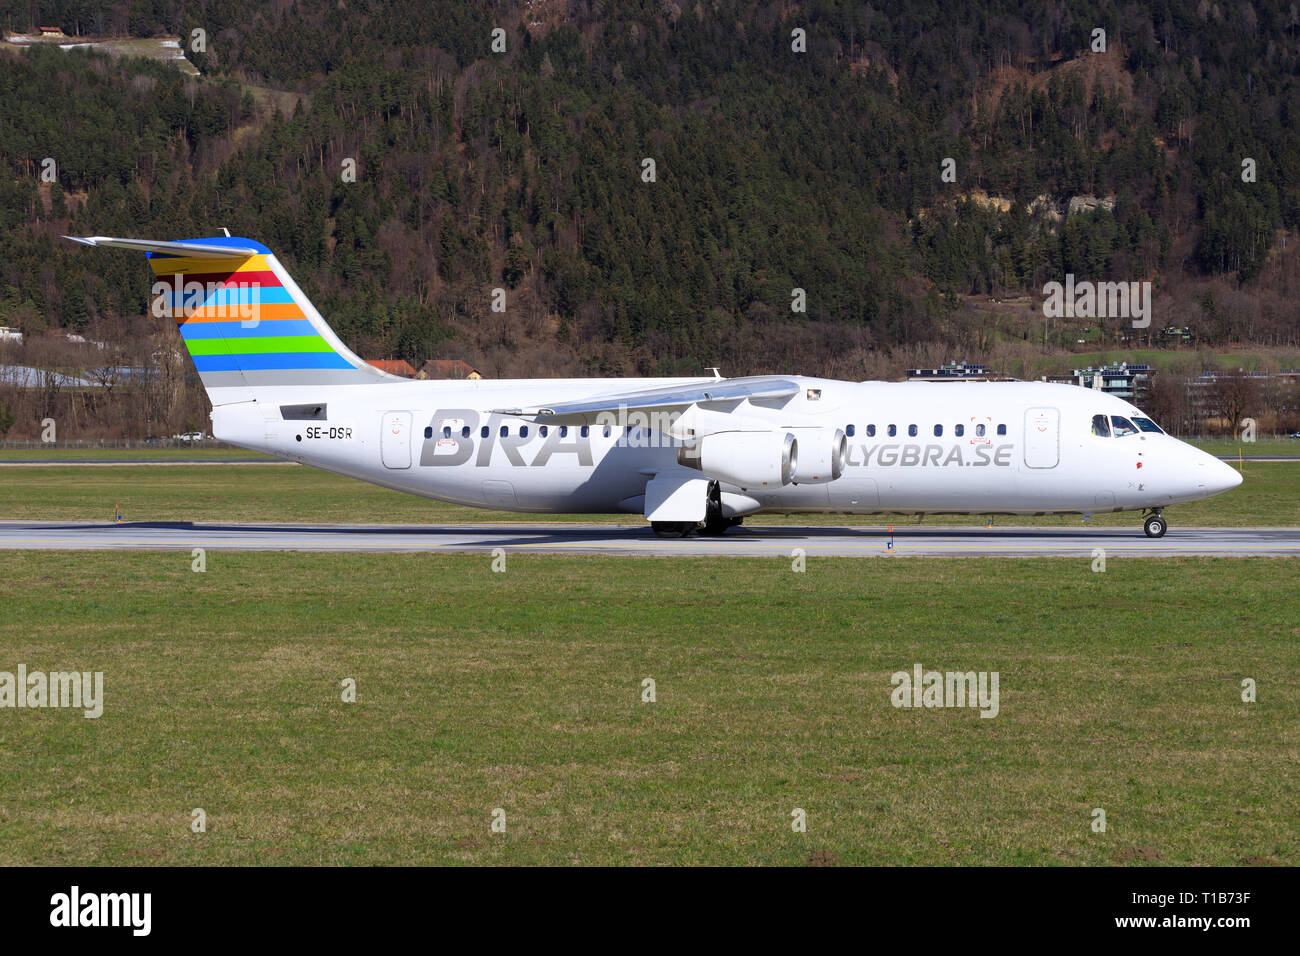 Austria January 4, 2015:British Aerospace Avro RJ100 from Malmö landing at Innsbruck Airport - Stock Image